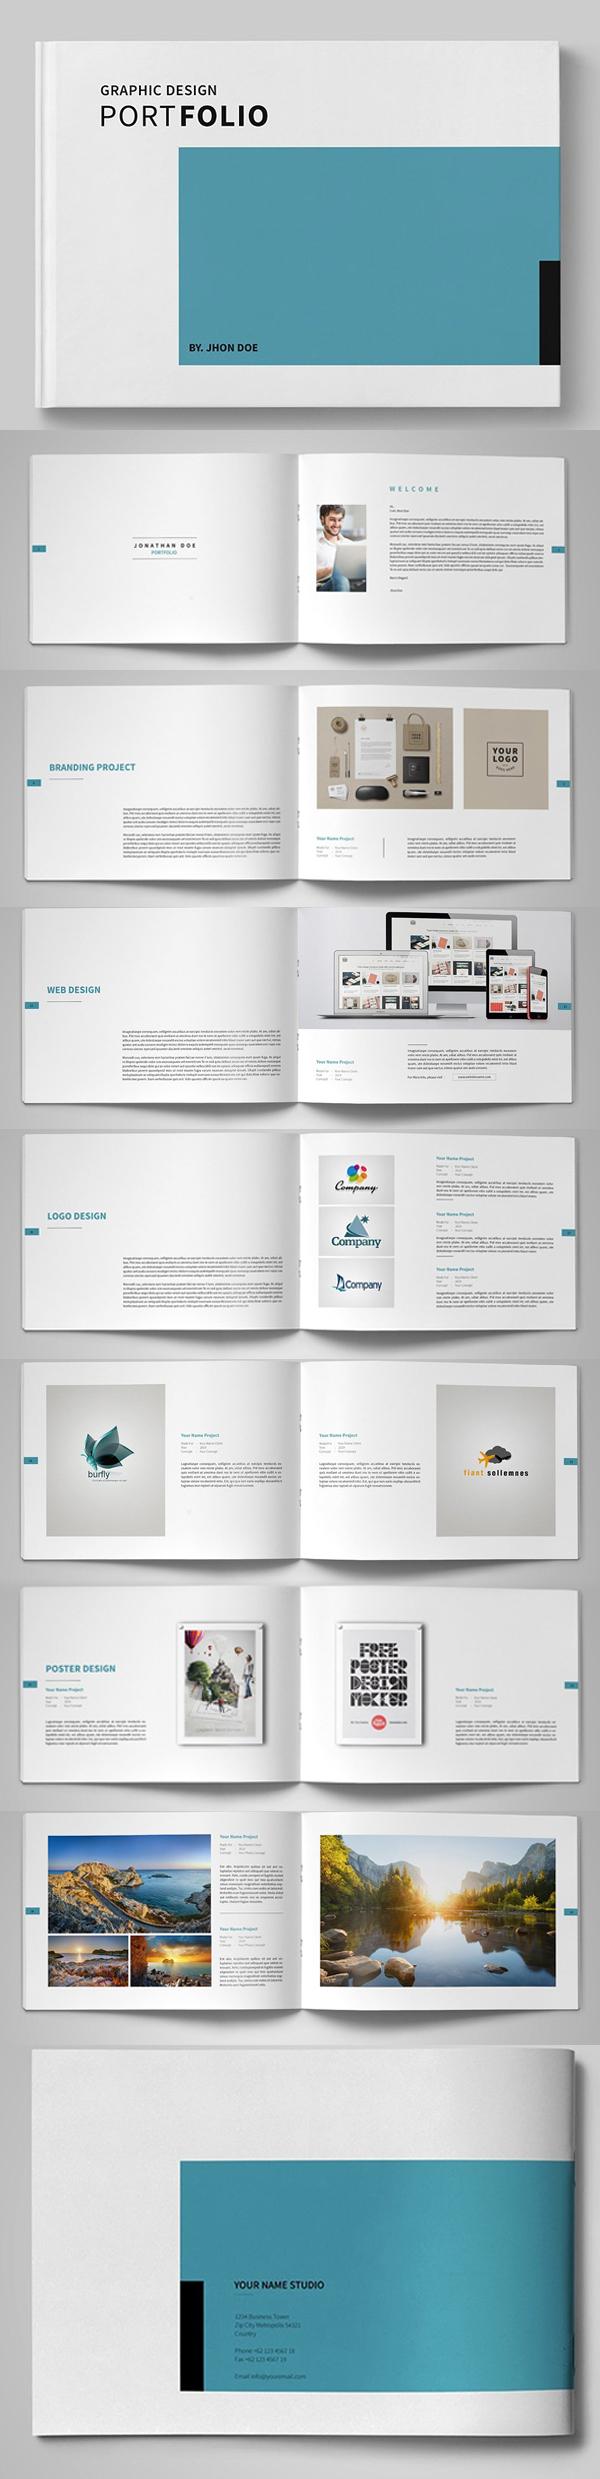 100 Professional Corporate Brochure Templates - 36